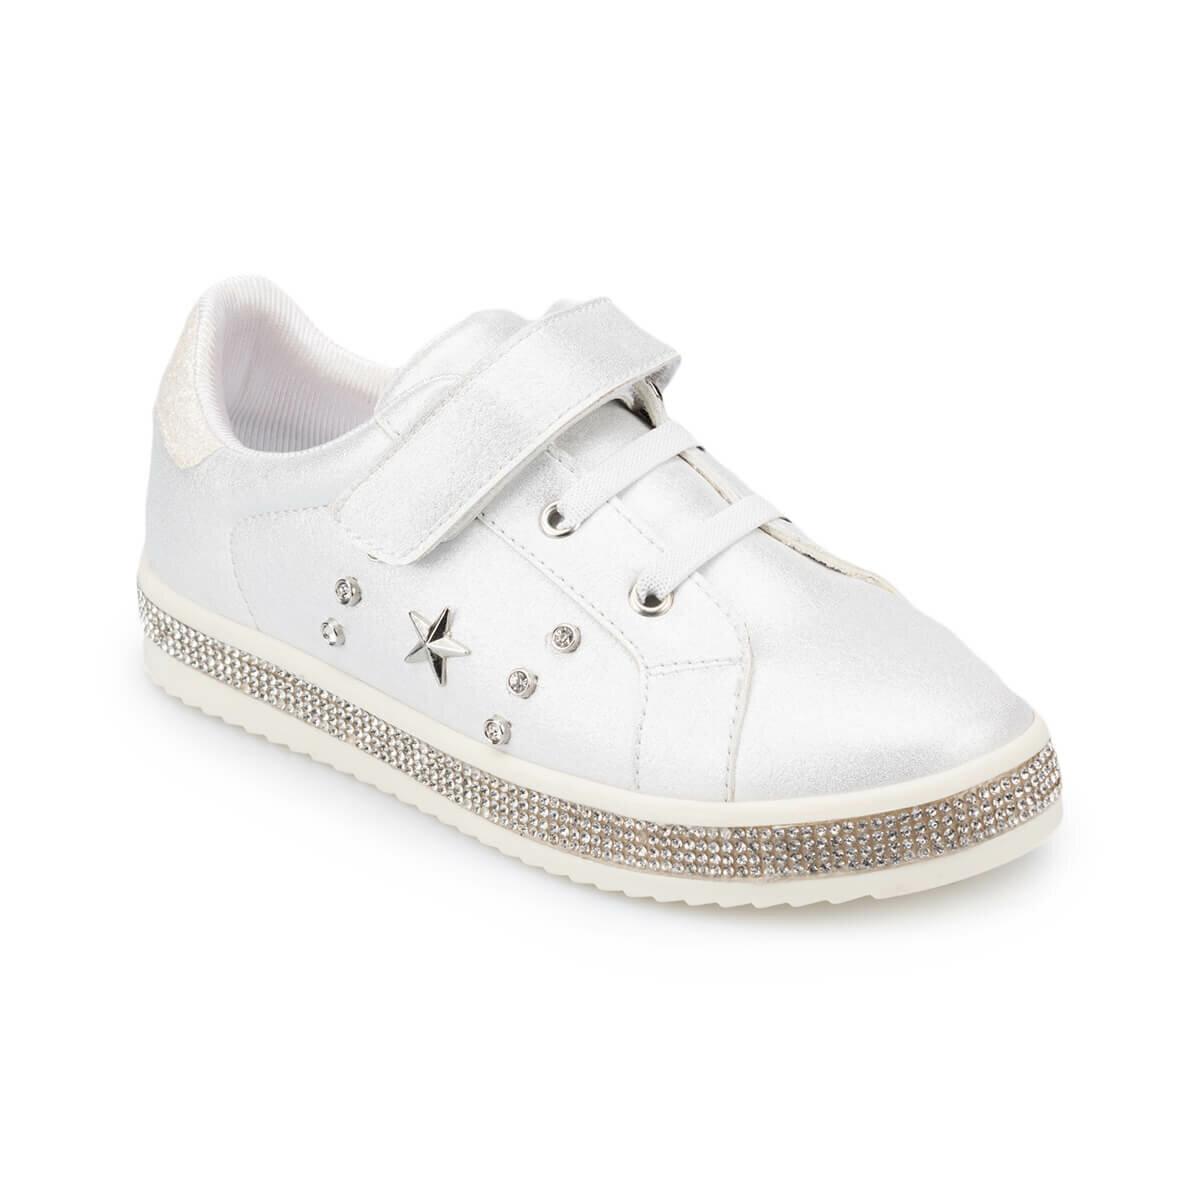 FLO 91.511367.F Gray Female Child Shoes Polaris